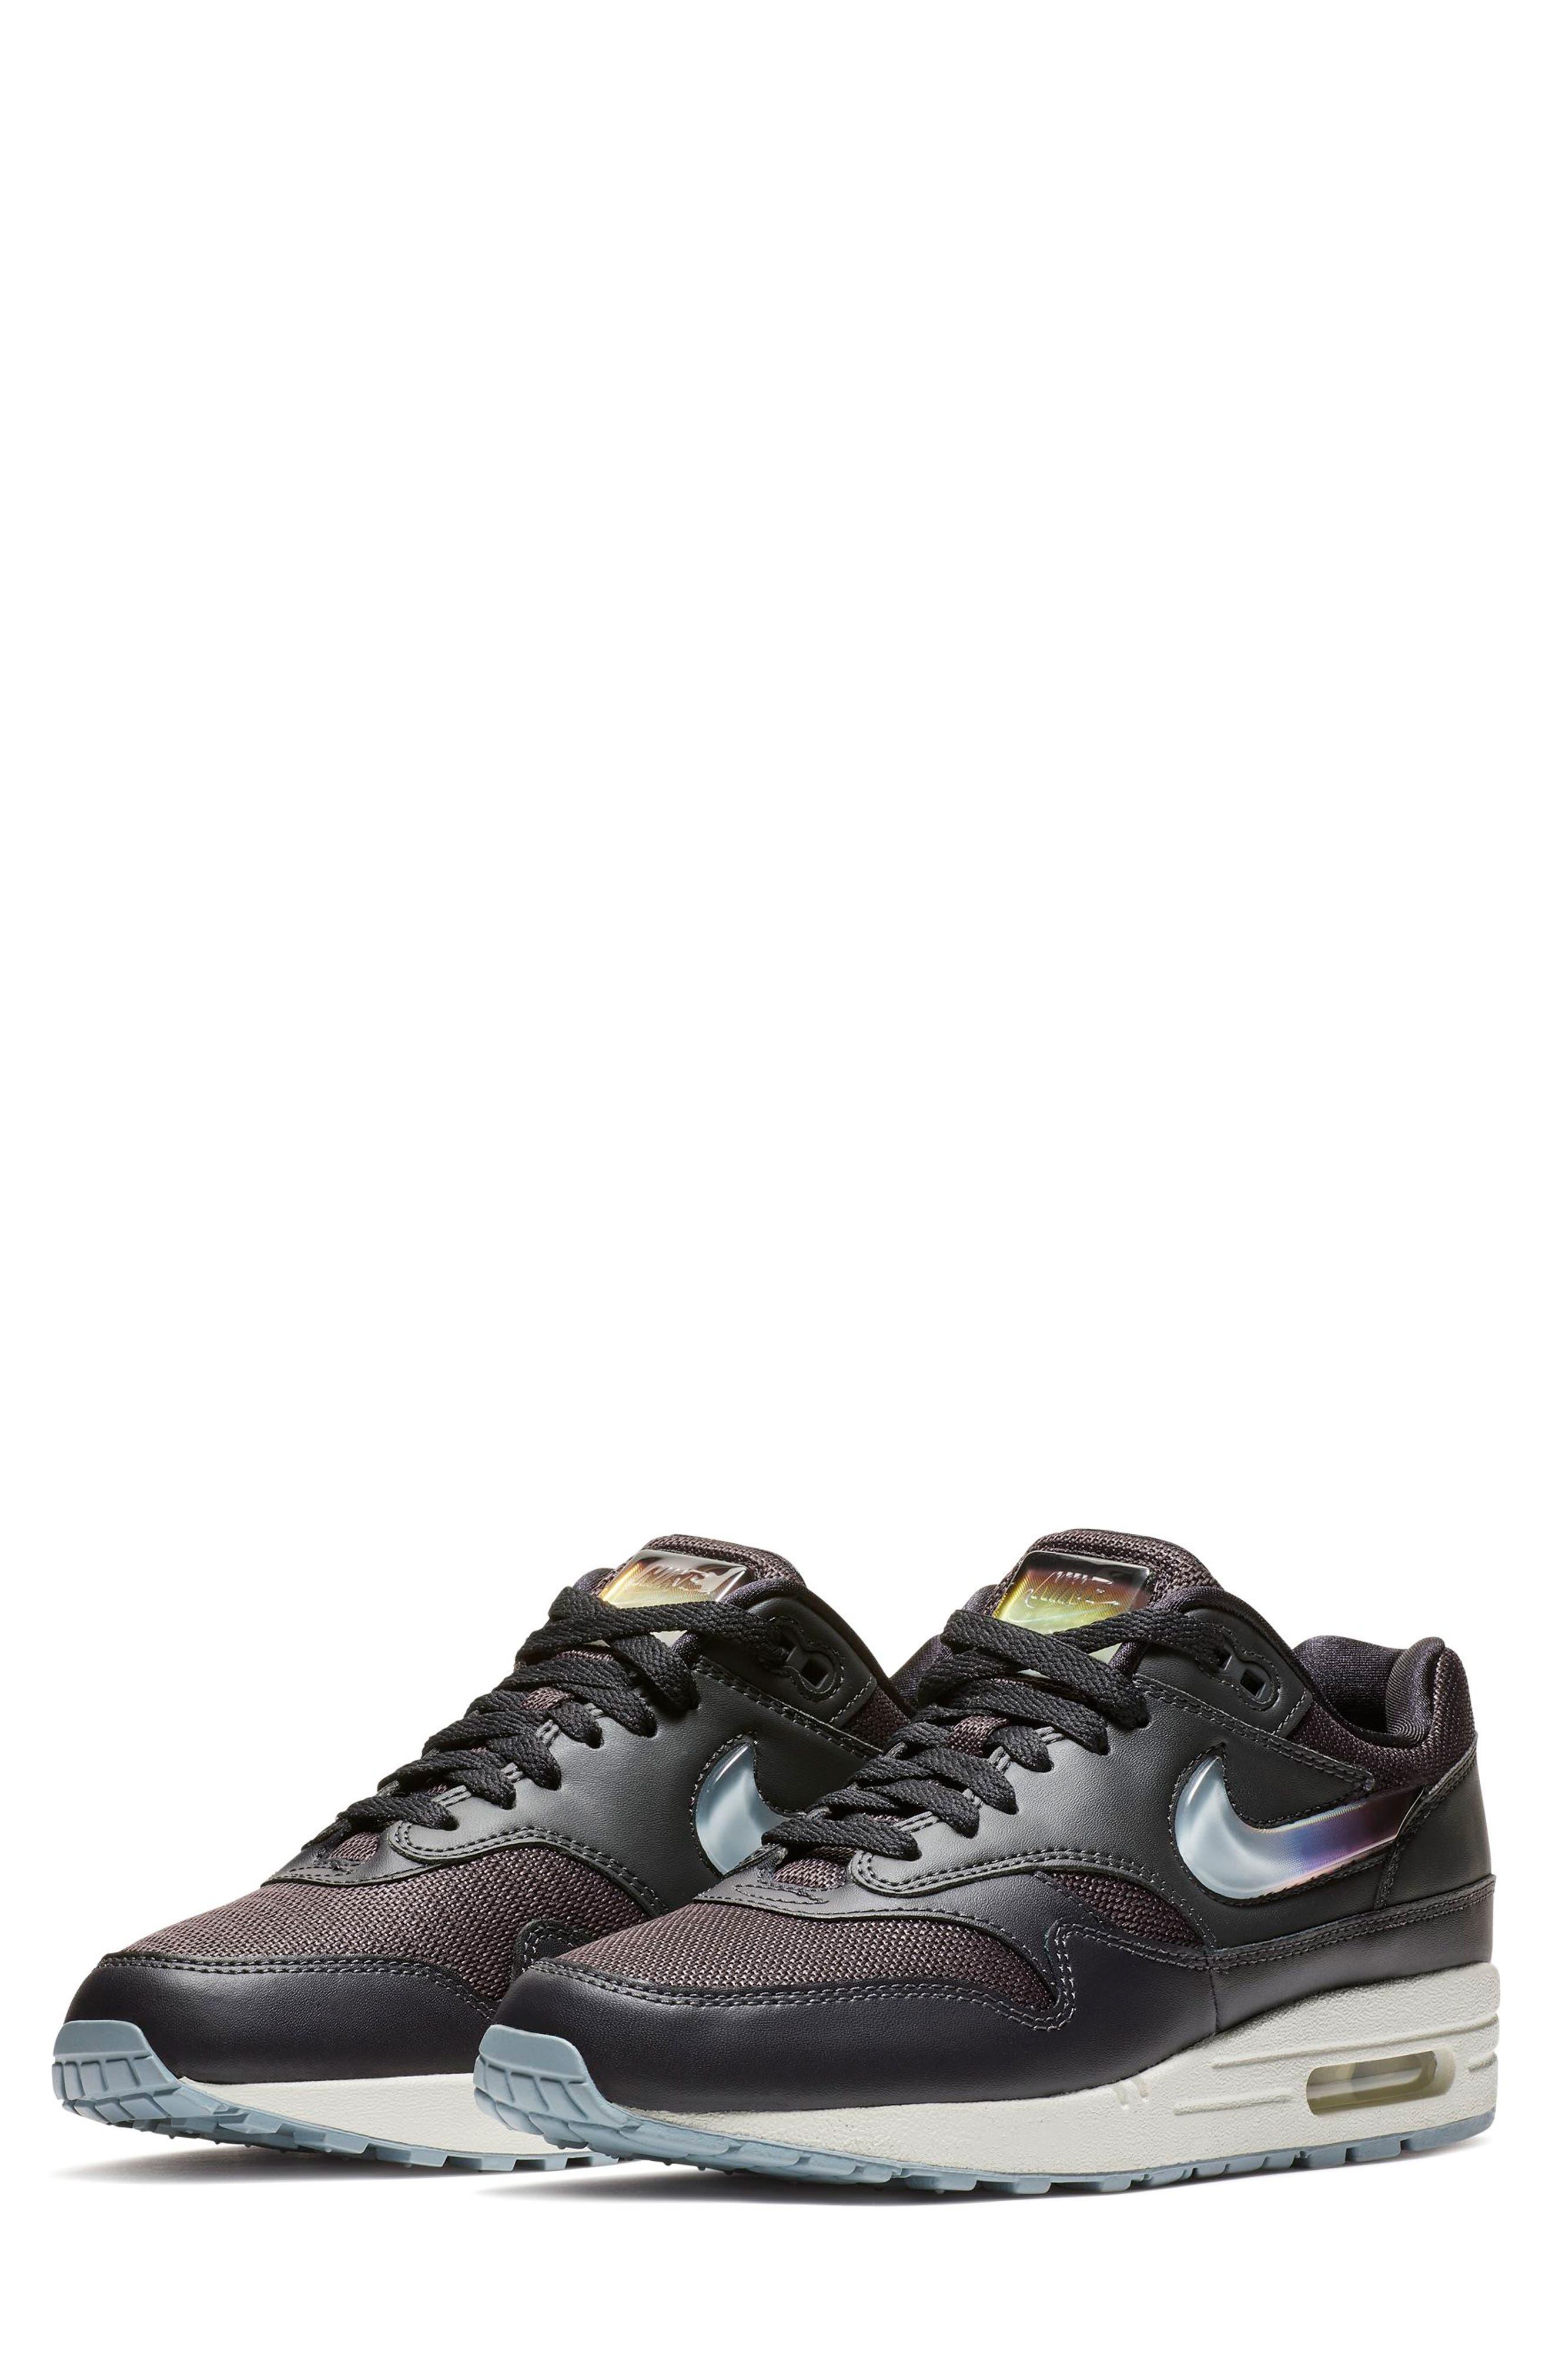 NIKE Air Max 1 JP Sneaker, Main, color, OIL GREY/ OBSIDIAN/ WHITE